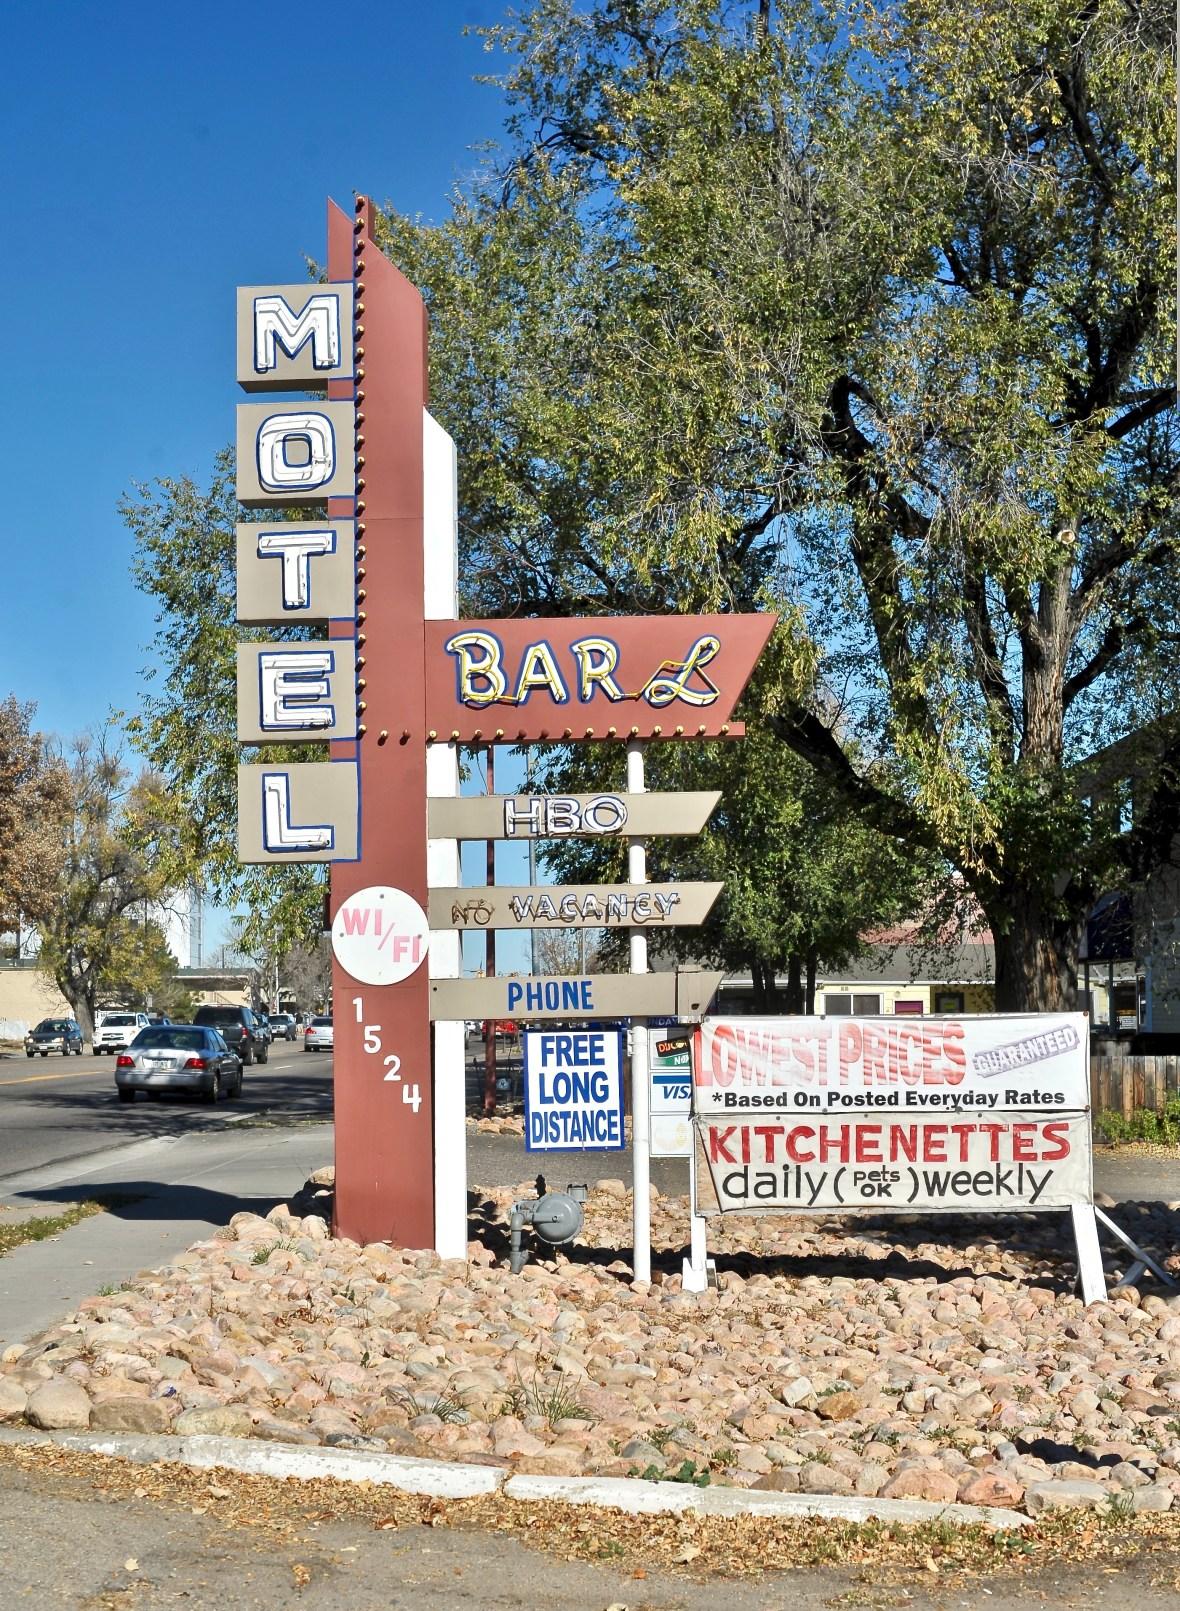 Bar L Motel - 1524 Main Street, Longmont, Colorado U.S.A. - October 25, 2017